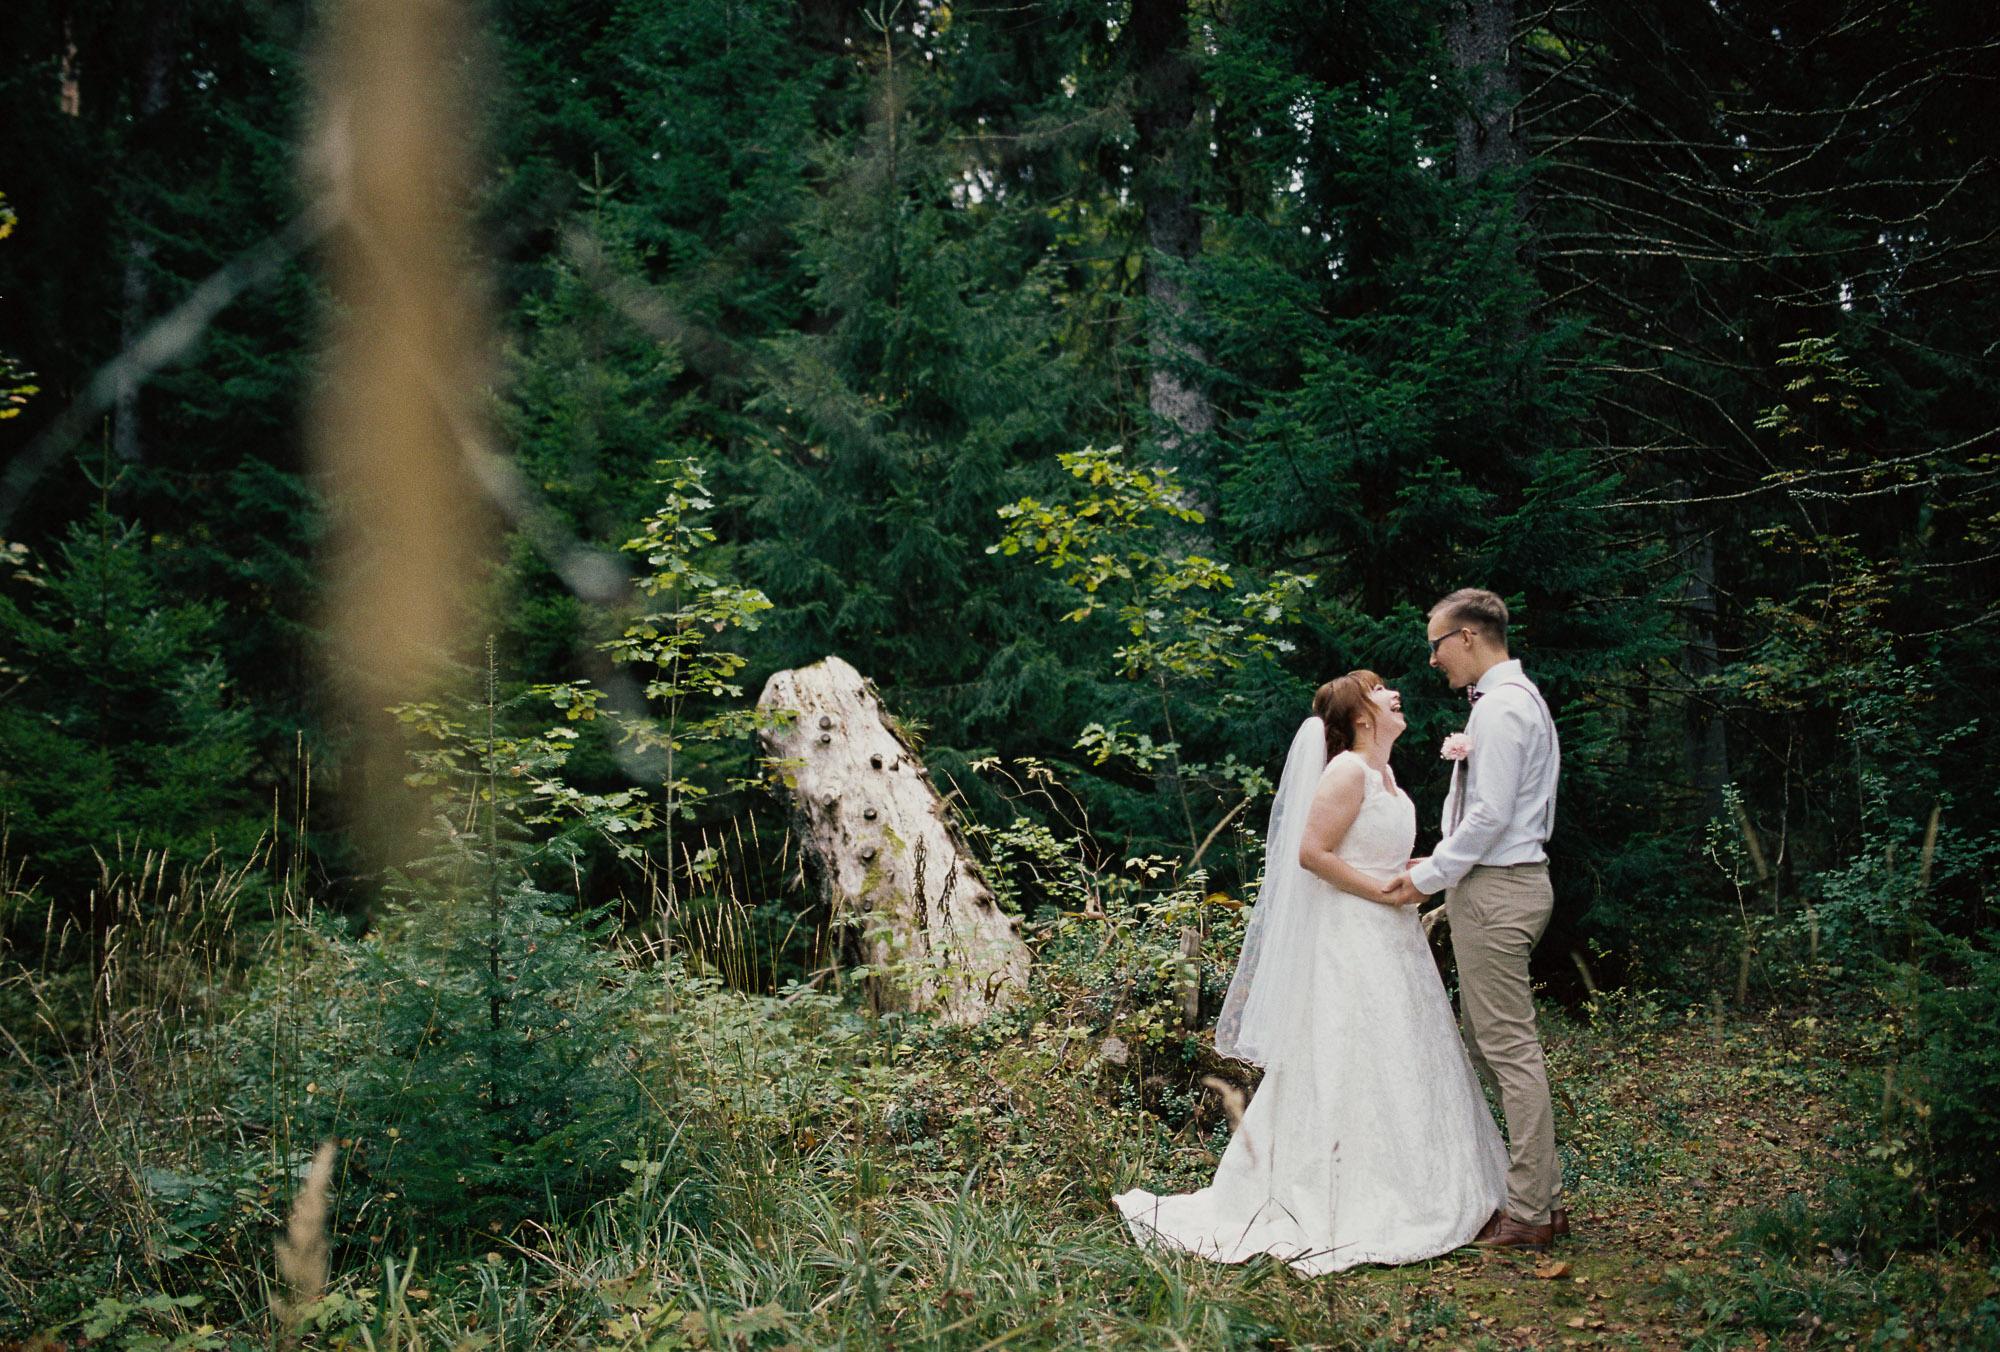 jere-satamo-analog-film-wedding-photographer-finland-083.jpg